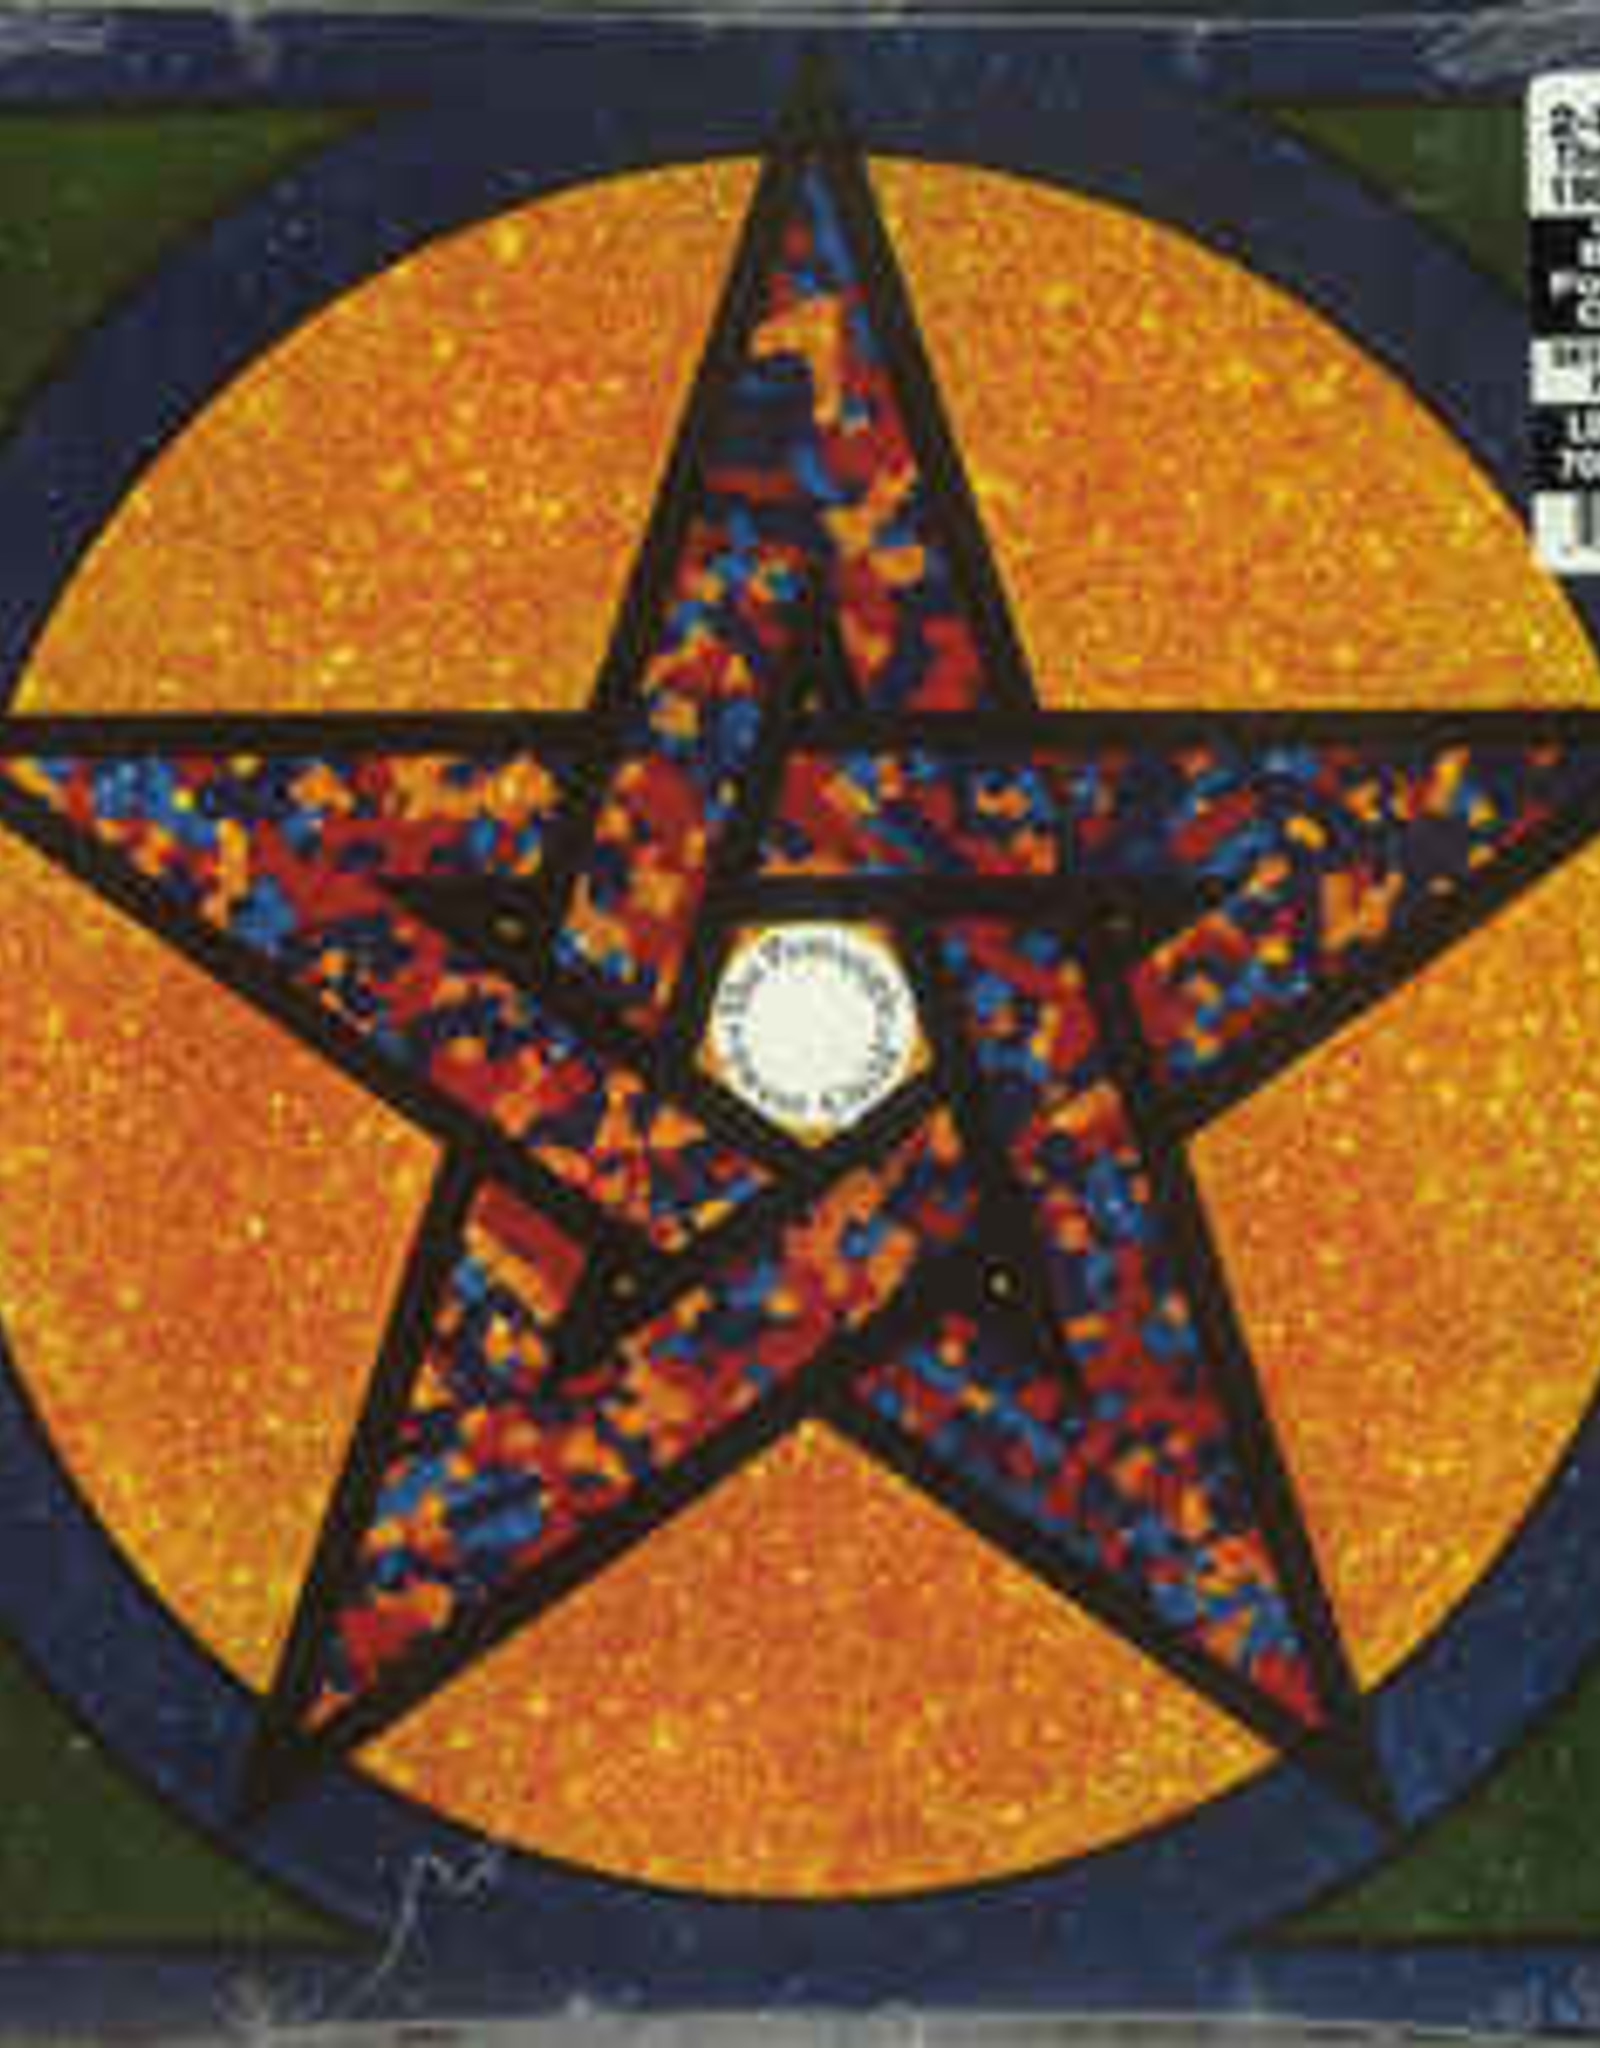 Pentangle - Sweet Child (Limited 50th Anniversary Sky Blue Vinyl Edition)